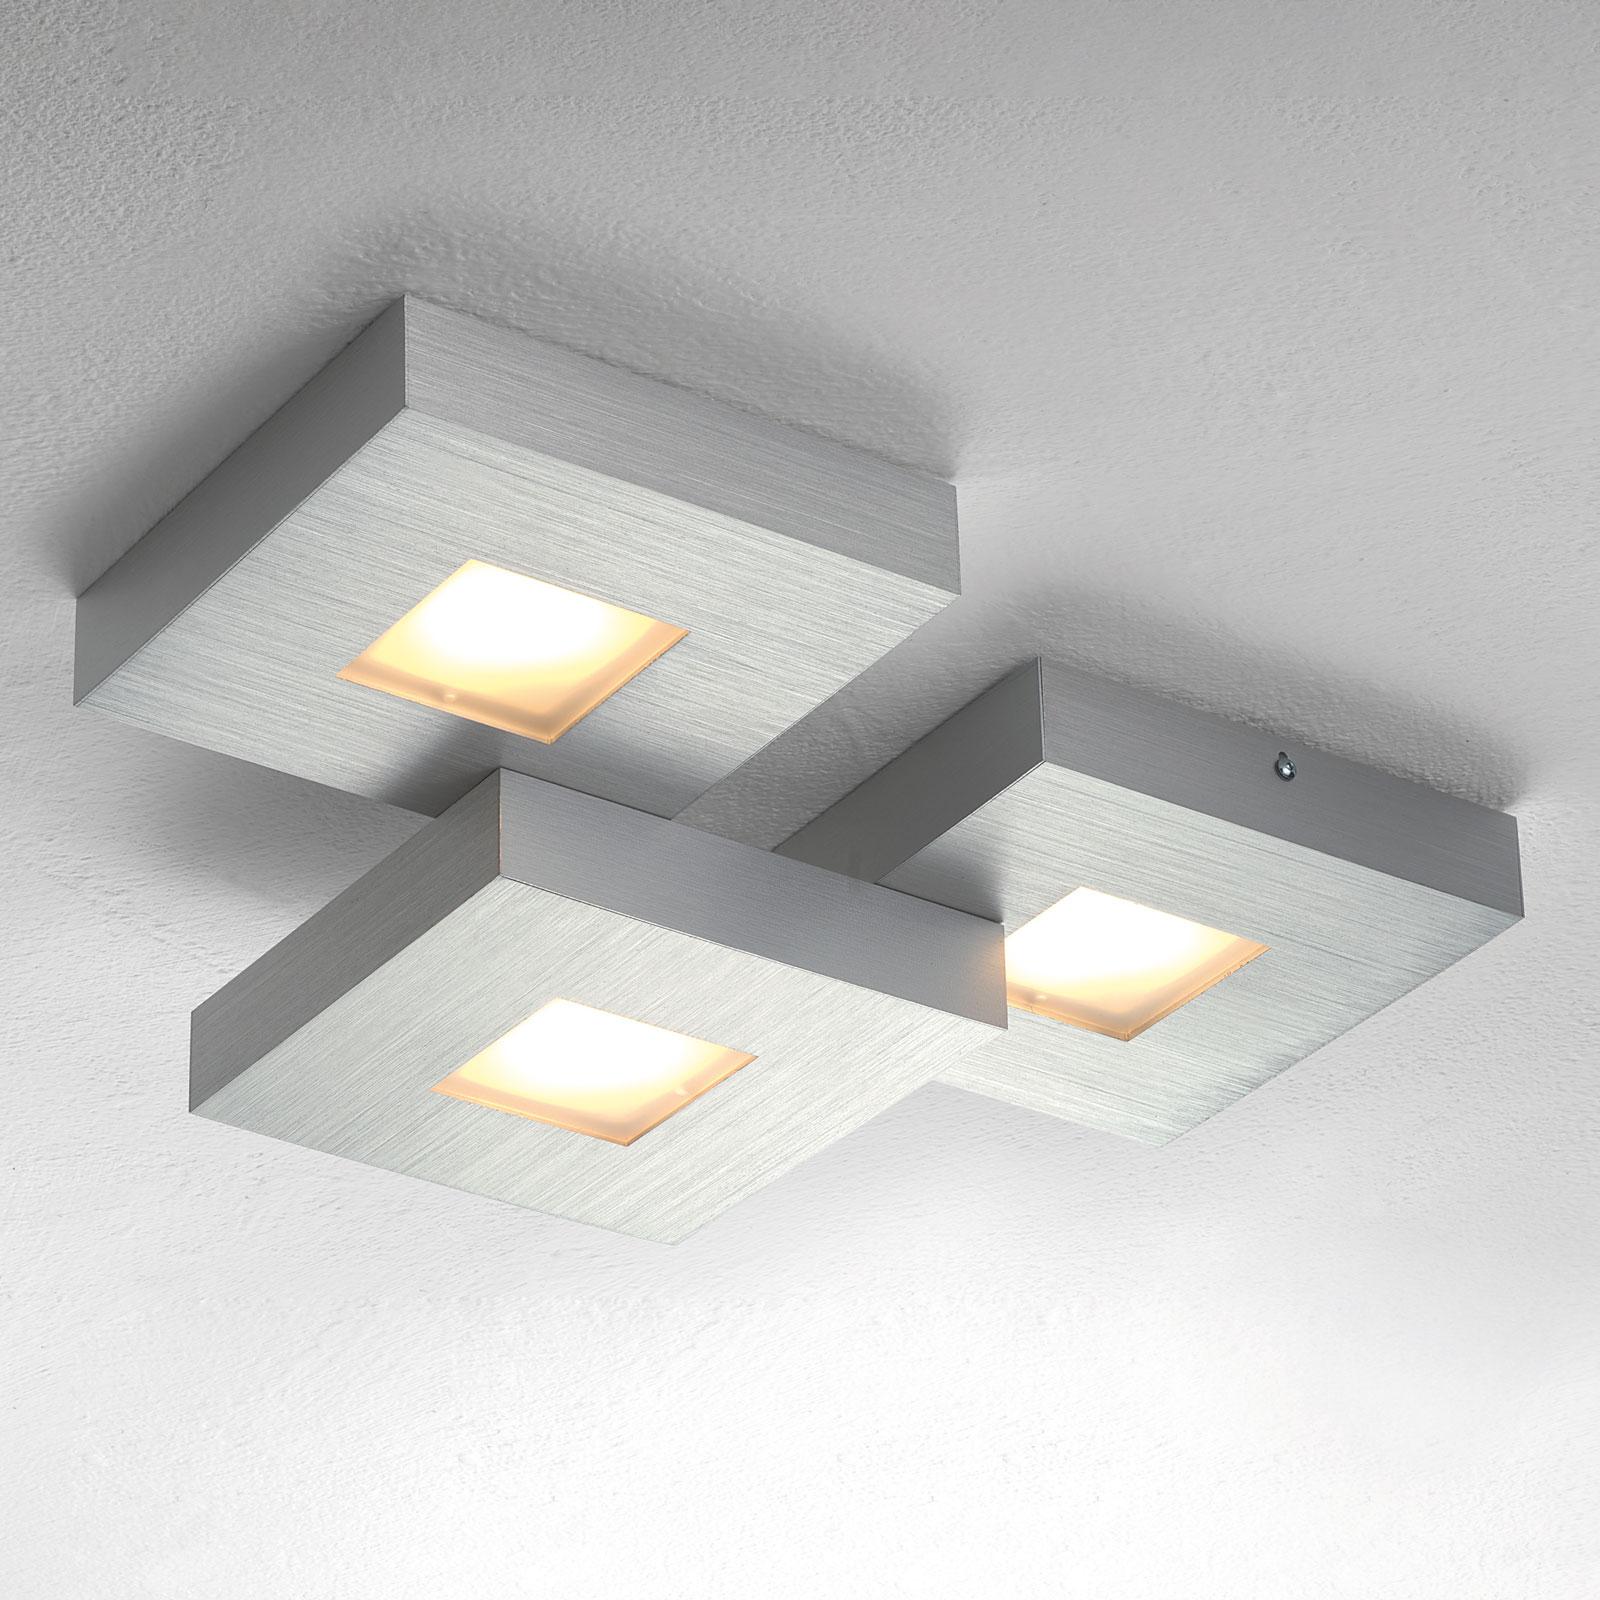 Lámpara de techo LED Cubus de 3 puntos de luz